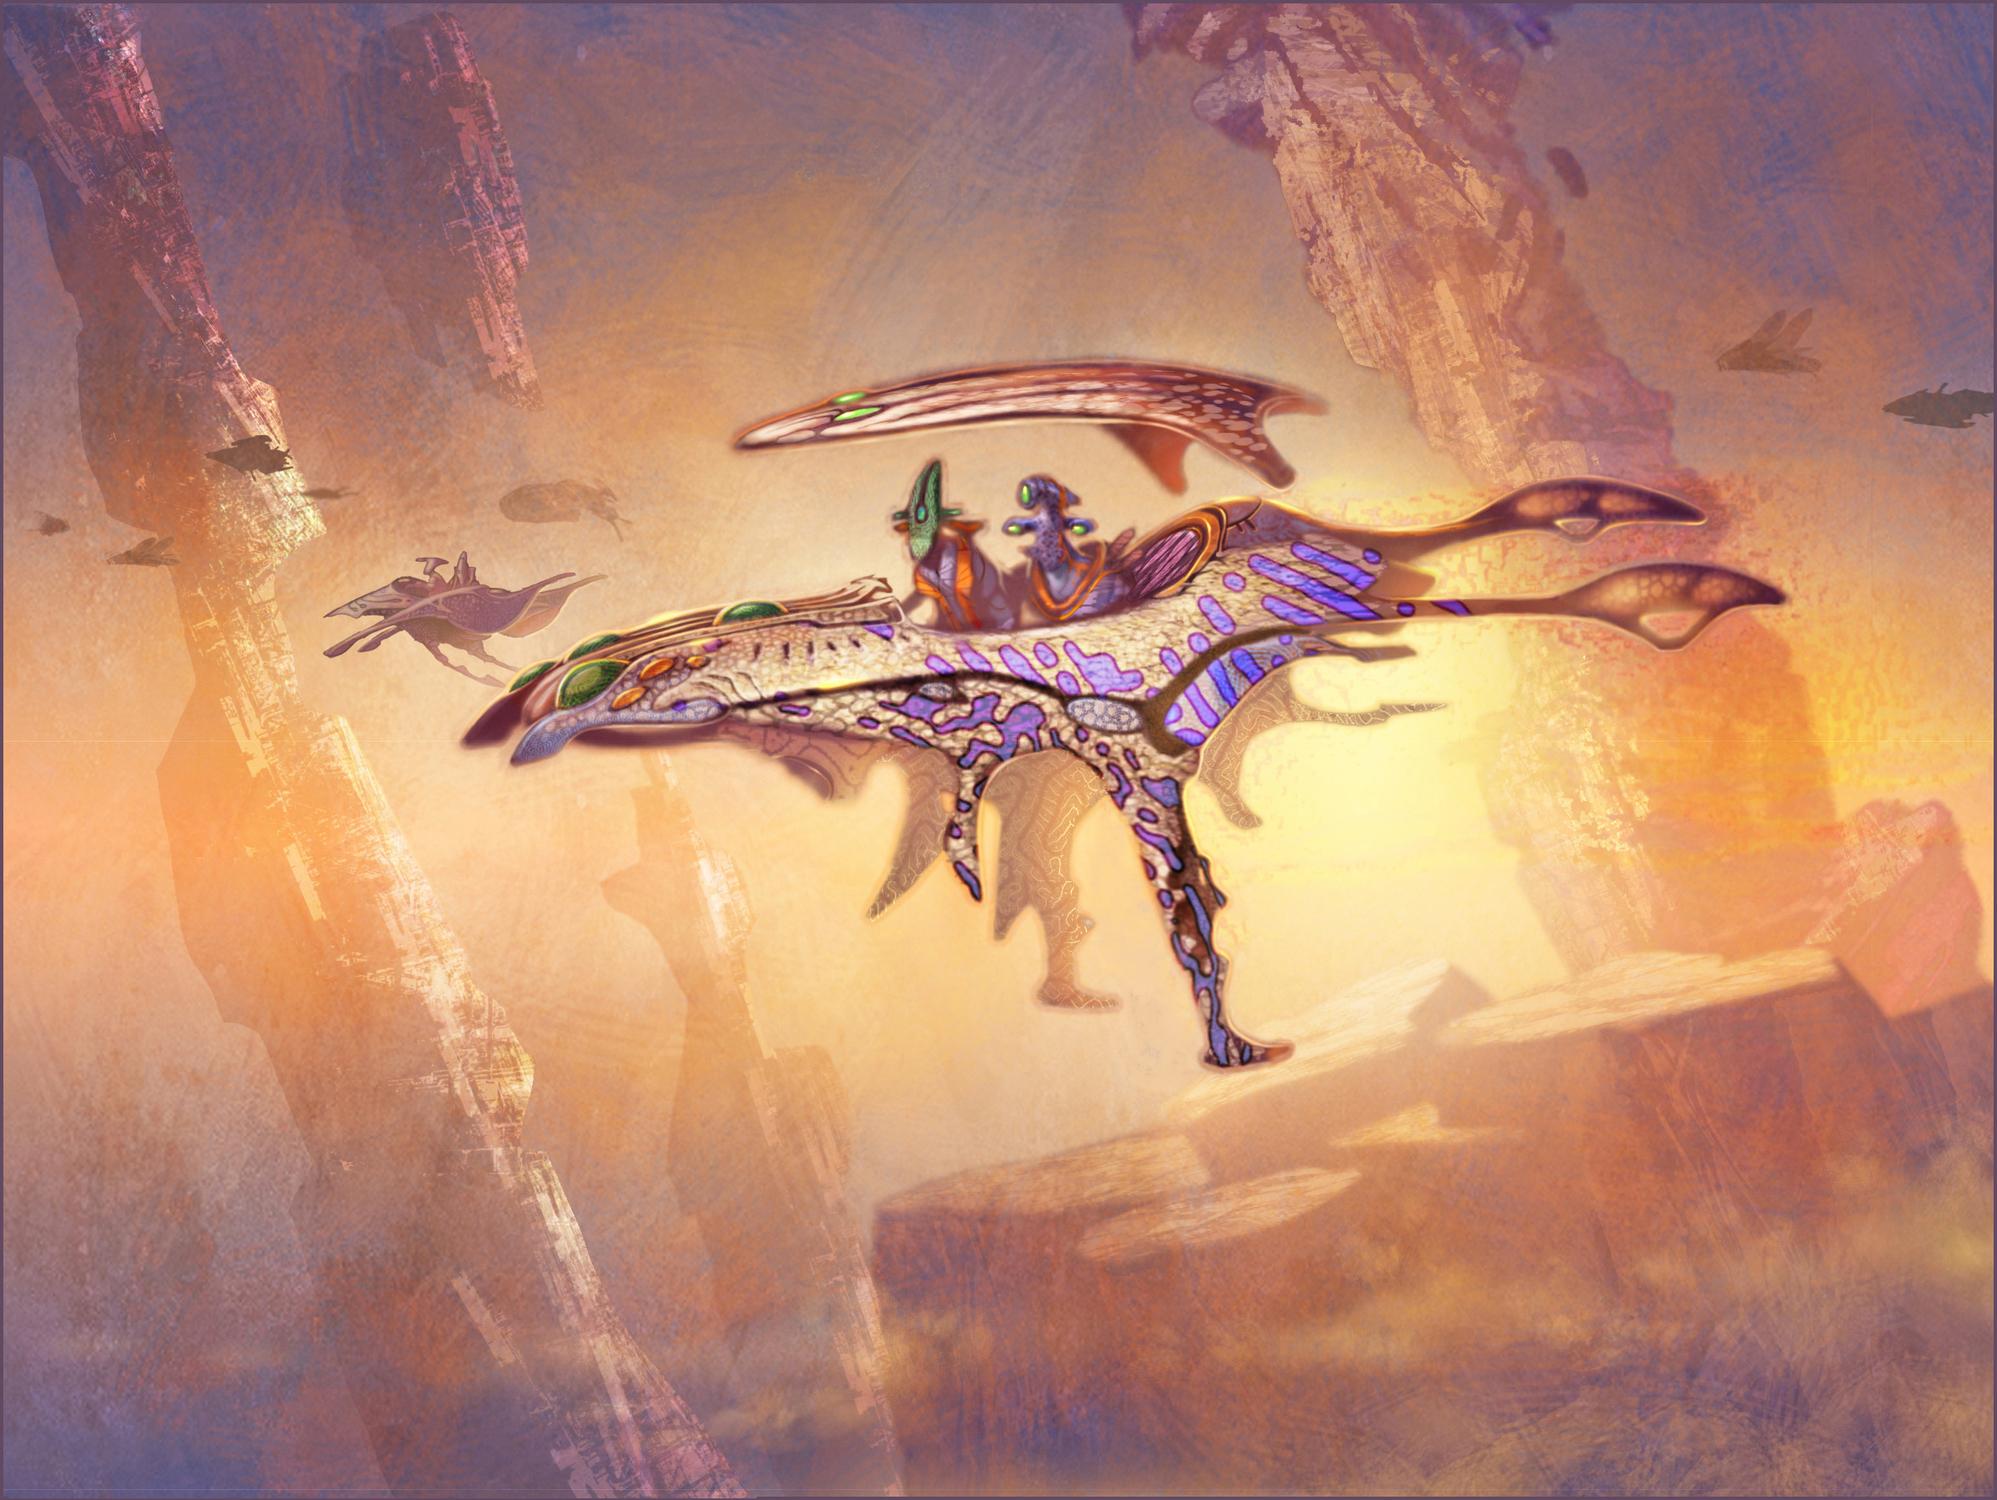 Alien Transport Concept Art Artwork by Gary Freeman